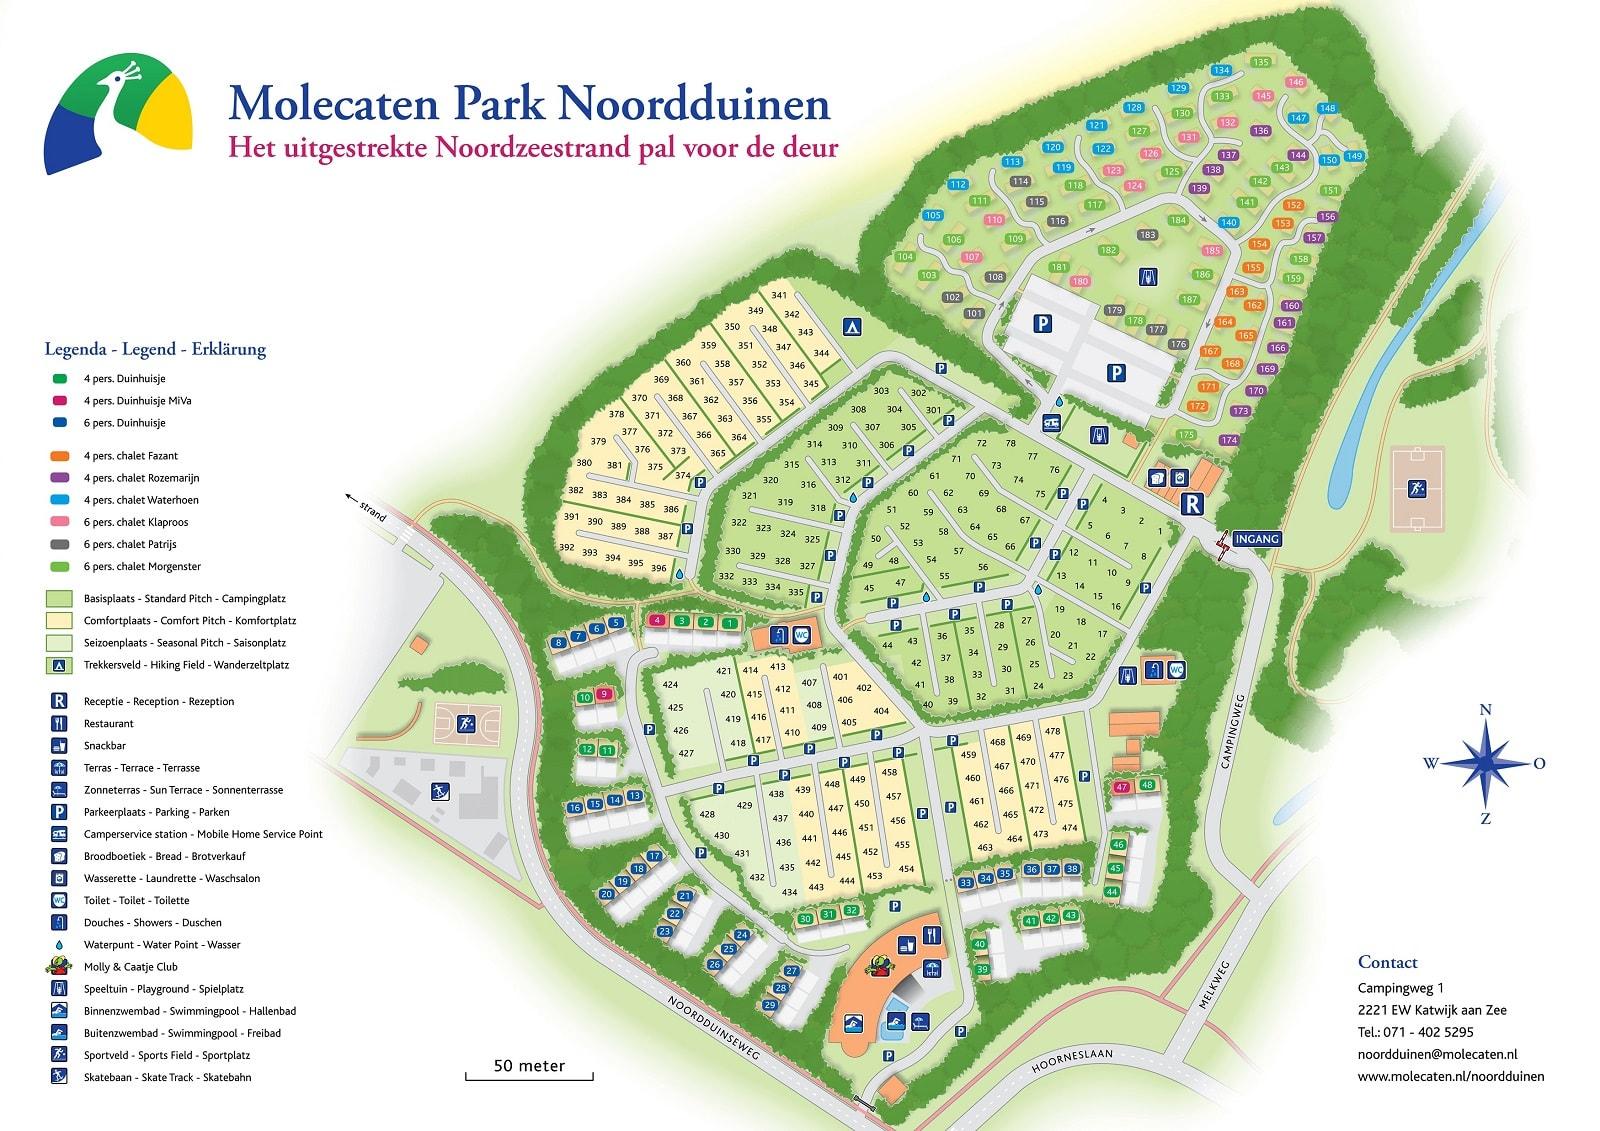 Molecaten Park Noordduinen